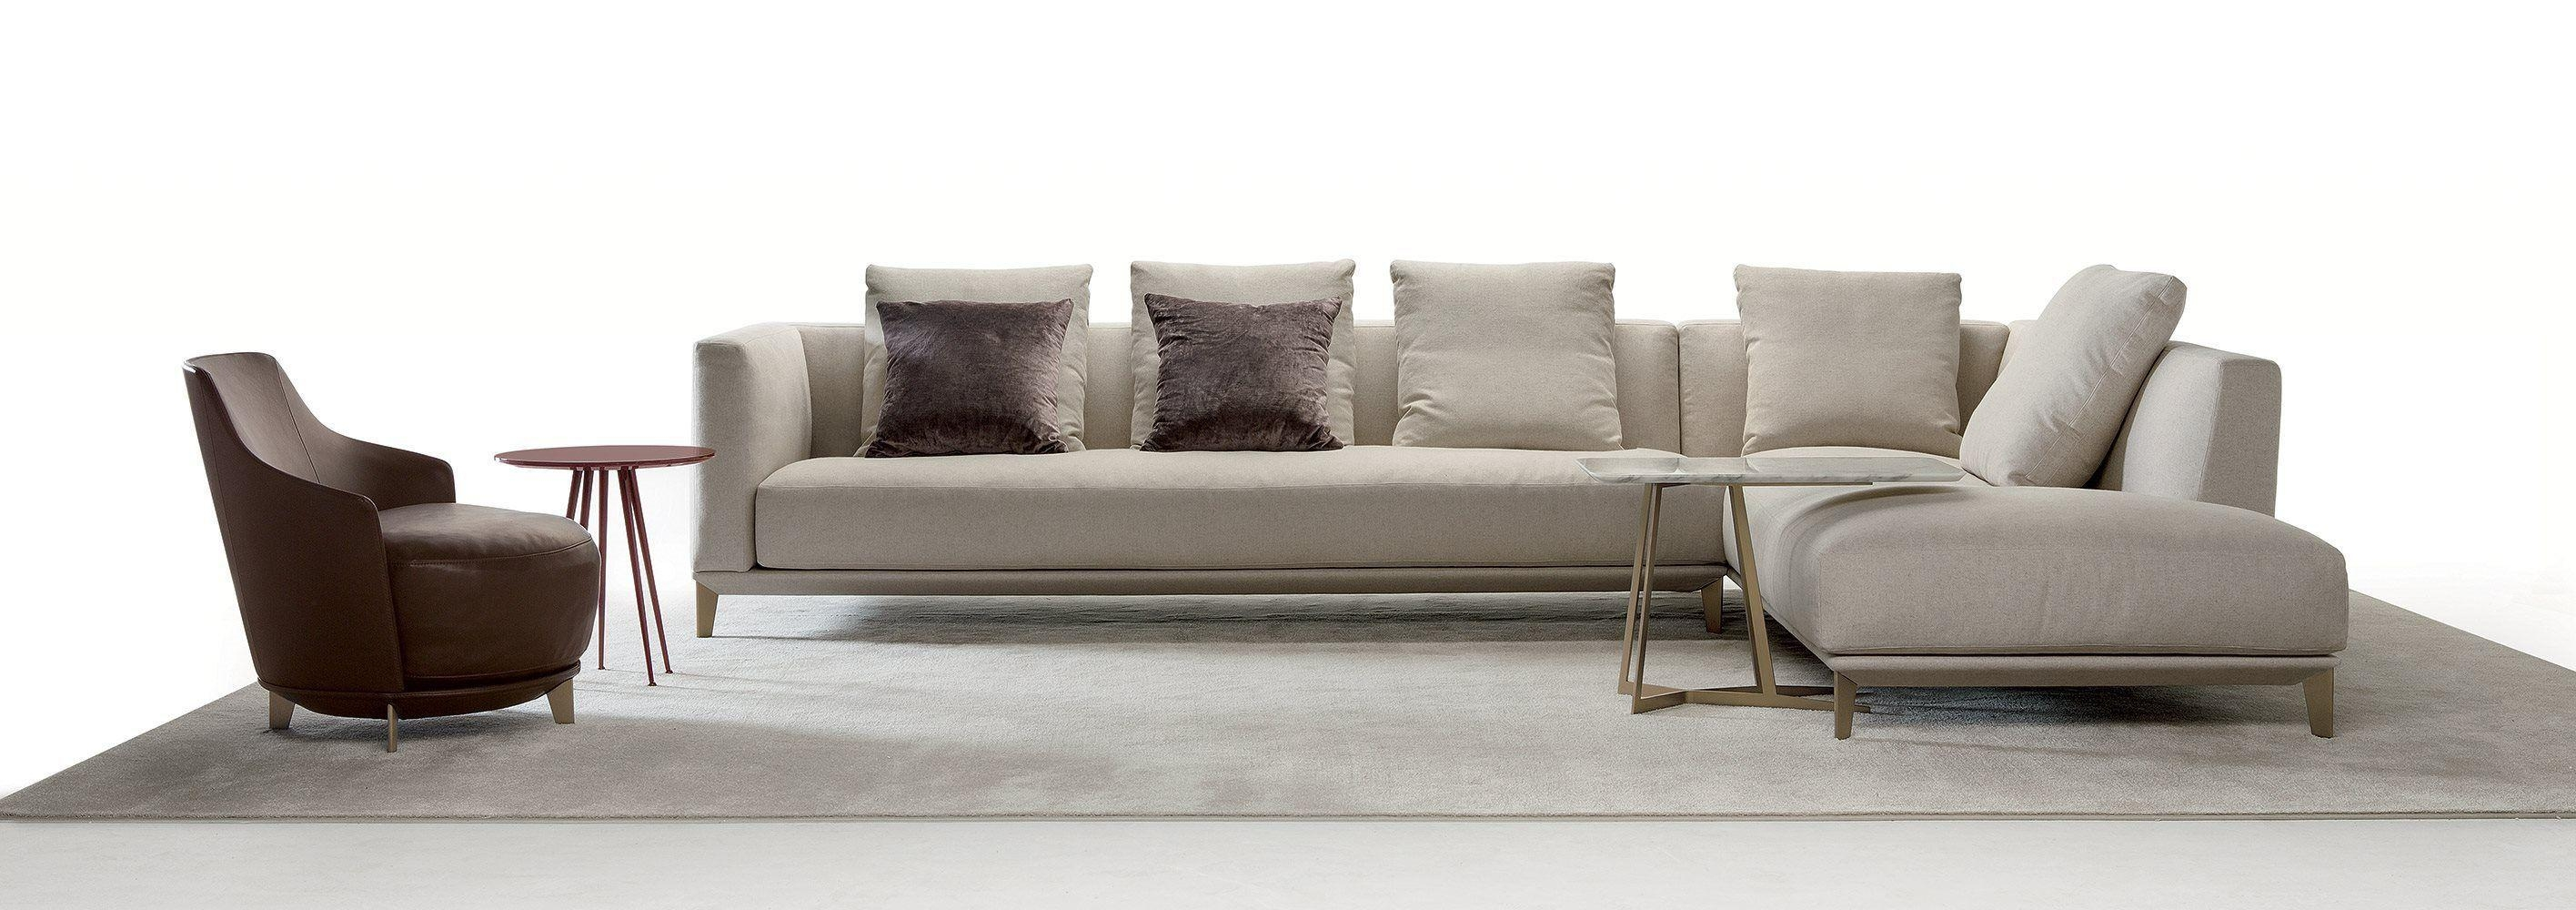 Corner Sofa / Modular / Contemporary / Fabric – Dylancastello Throughout Contemporary Fabric Sofas (View 6 of 20)